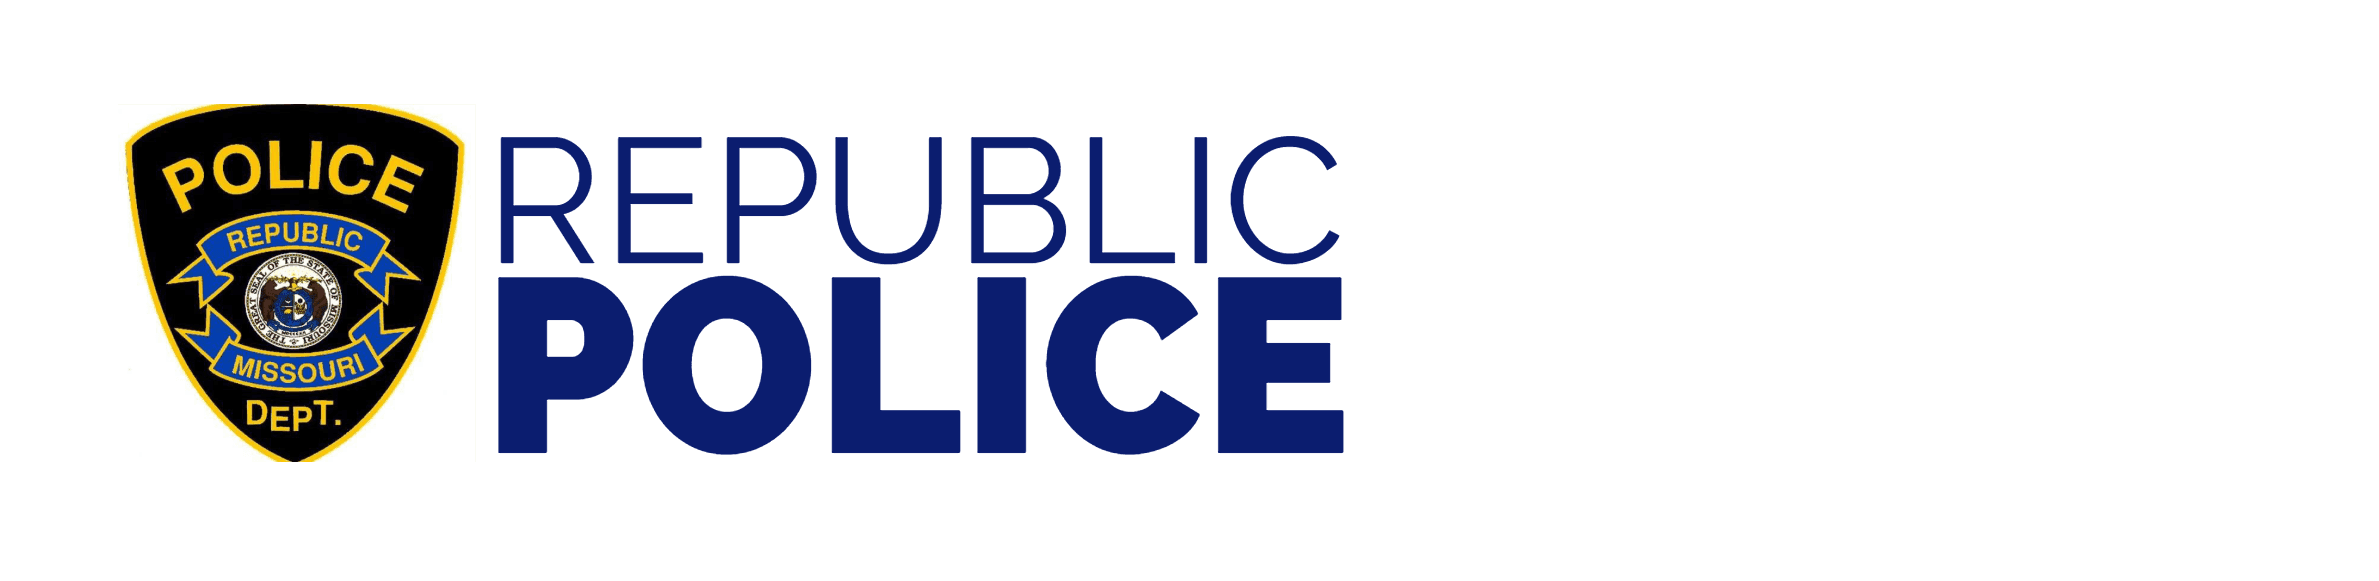 Jail & Arrest Information | Republic, MO